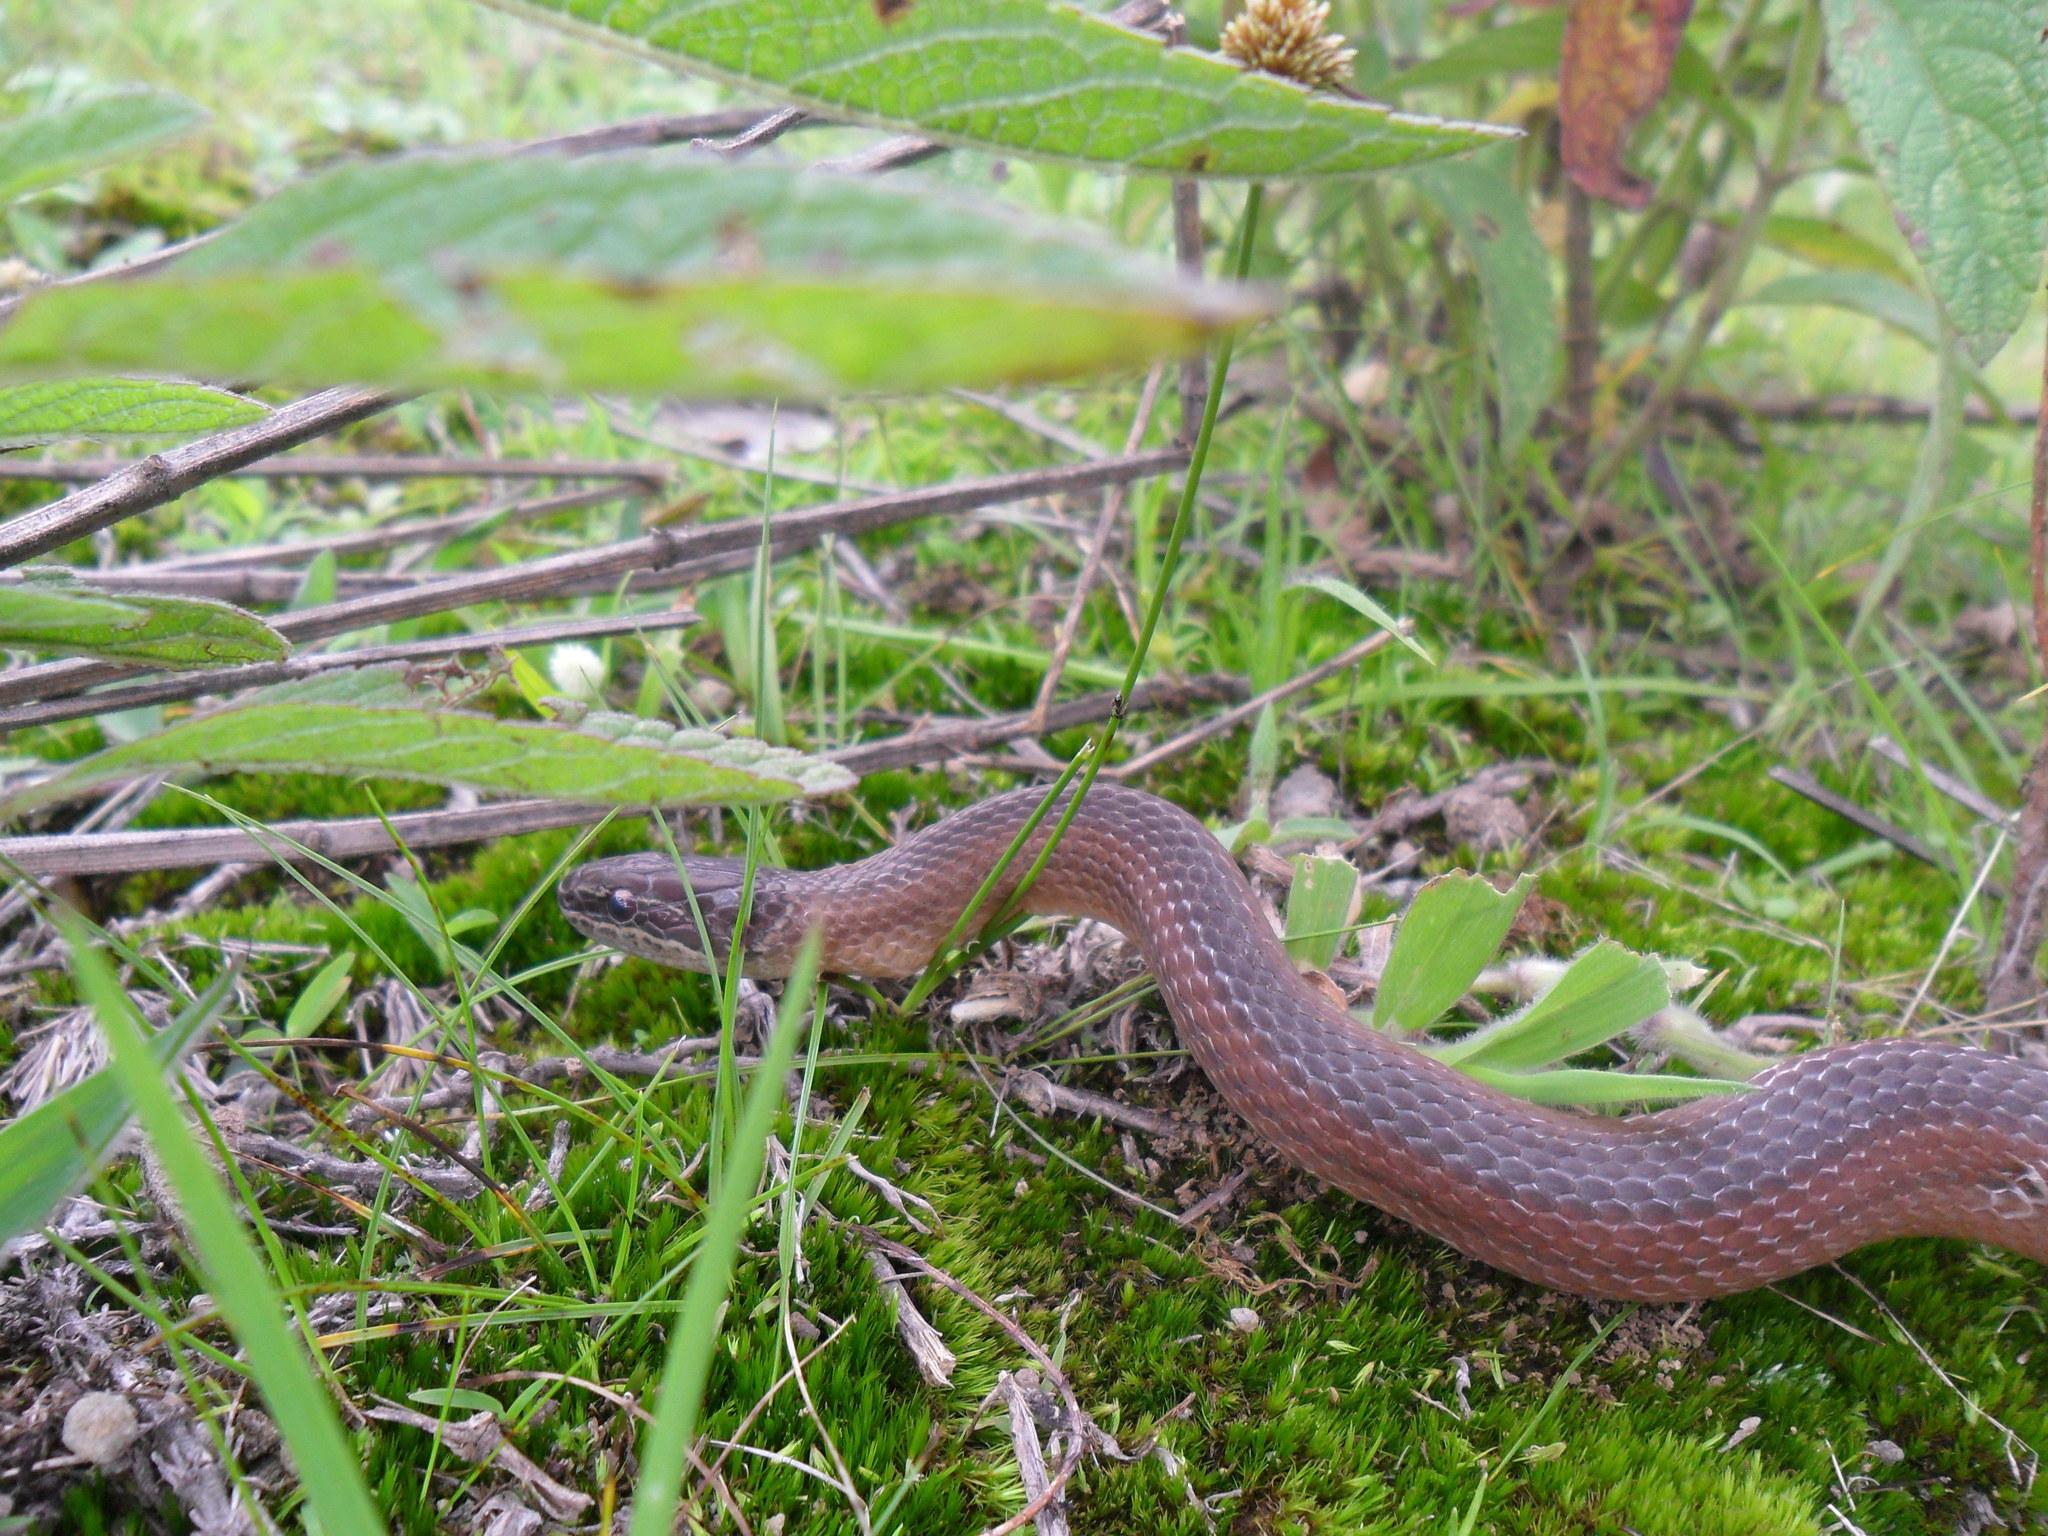 Image of Crowned Graceful Brown Snake